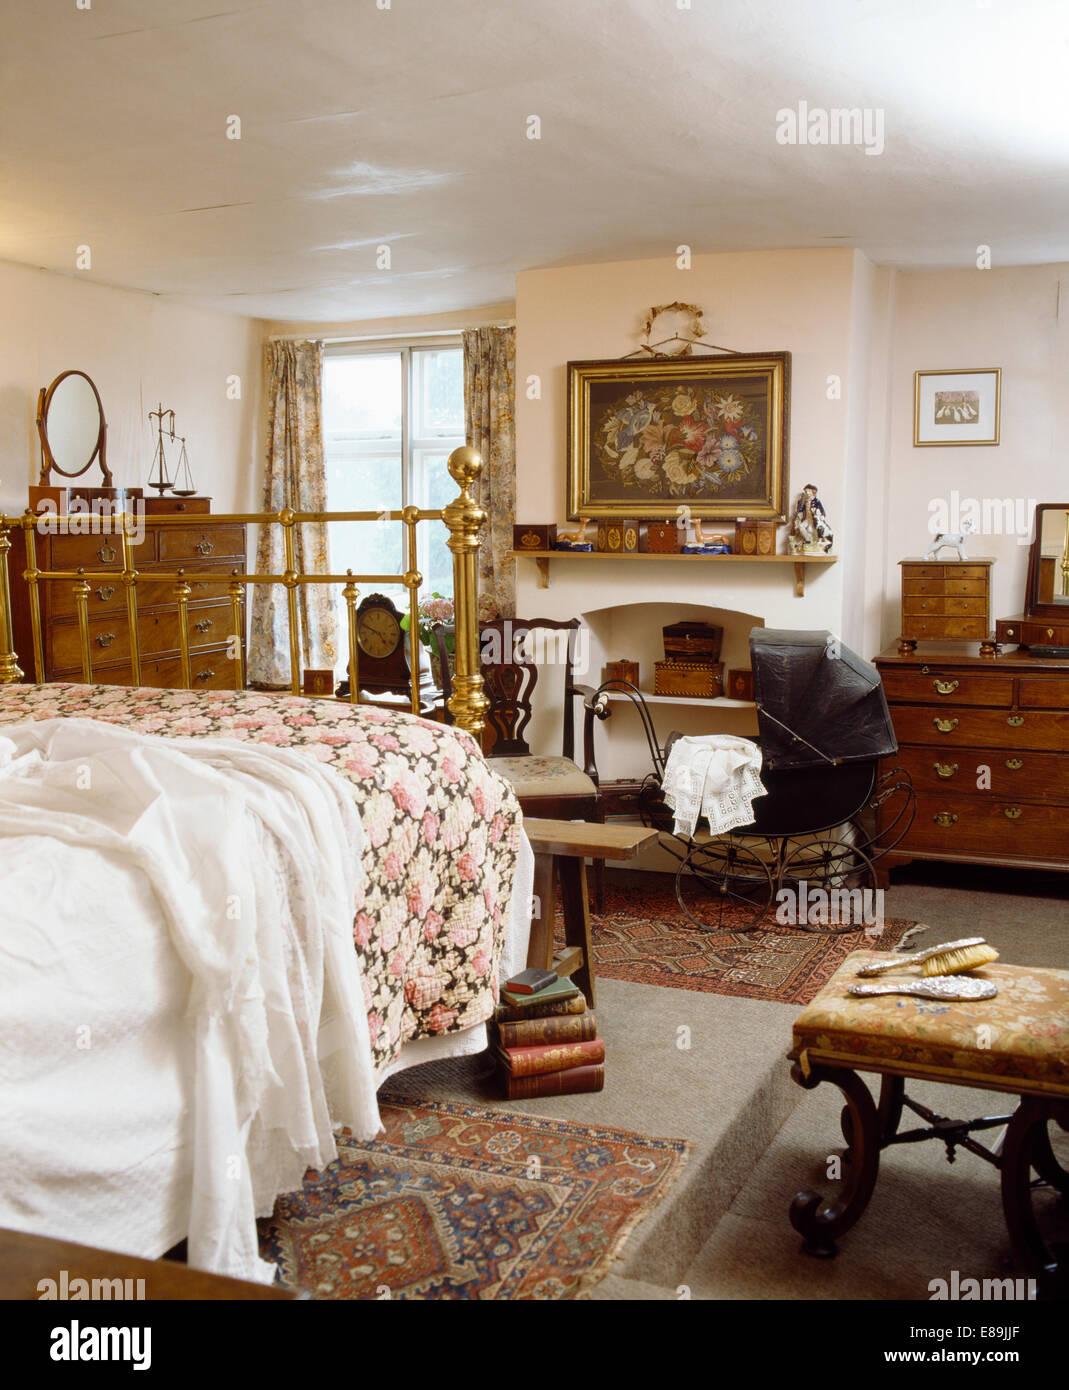 Rose gemustert Quilt auf antikem Messingbett im viktorianischen Stil ...